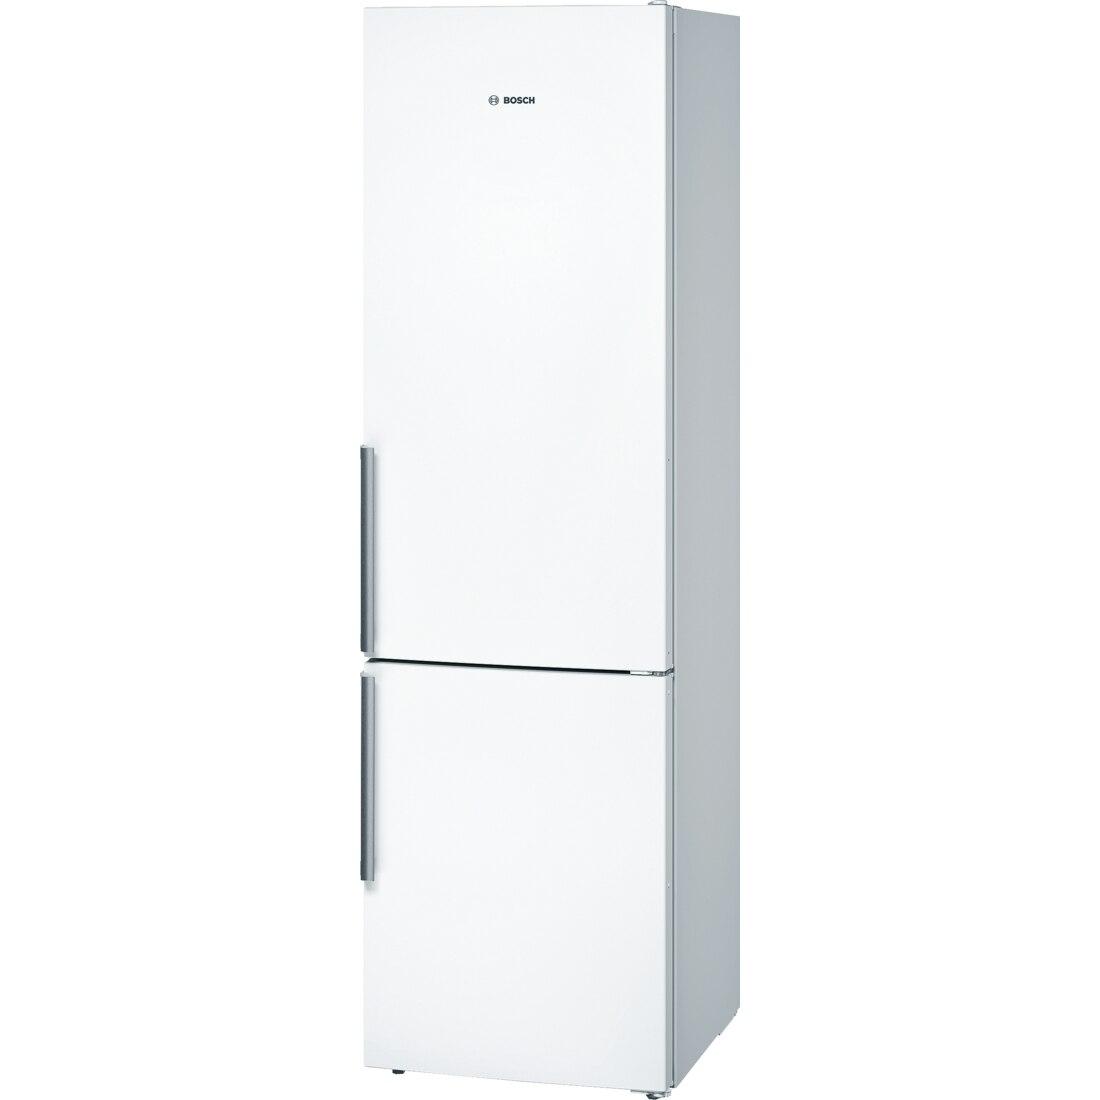 Fotografie Combina frigorifica Bosch KGN39VW35, 366 l, Clasa A++, No Frost, VitaFresh, Iluminare LED, H 203 cm, Alb